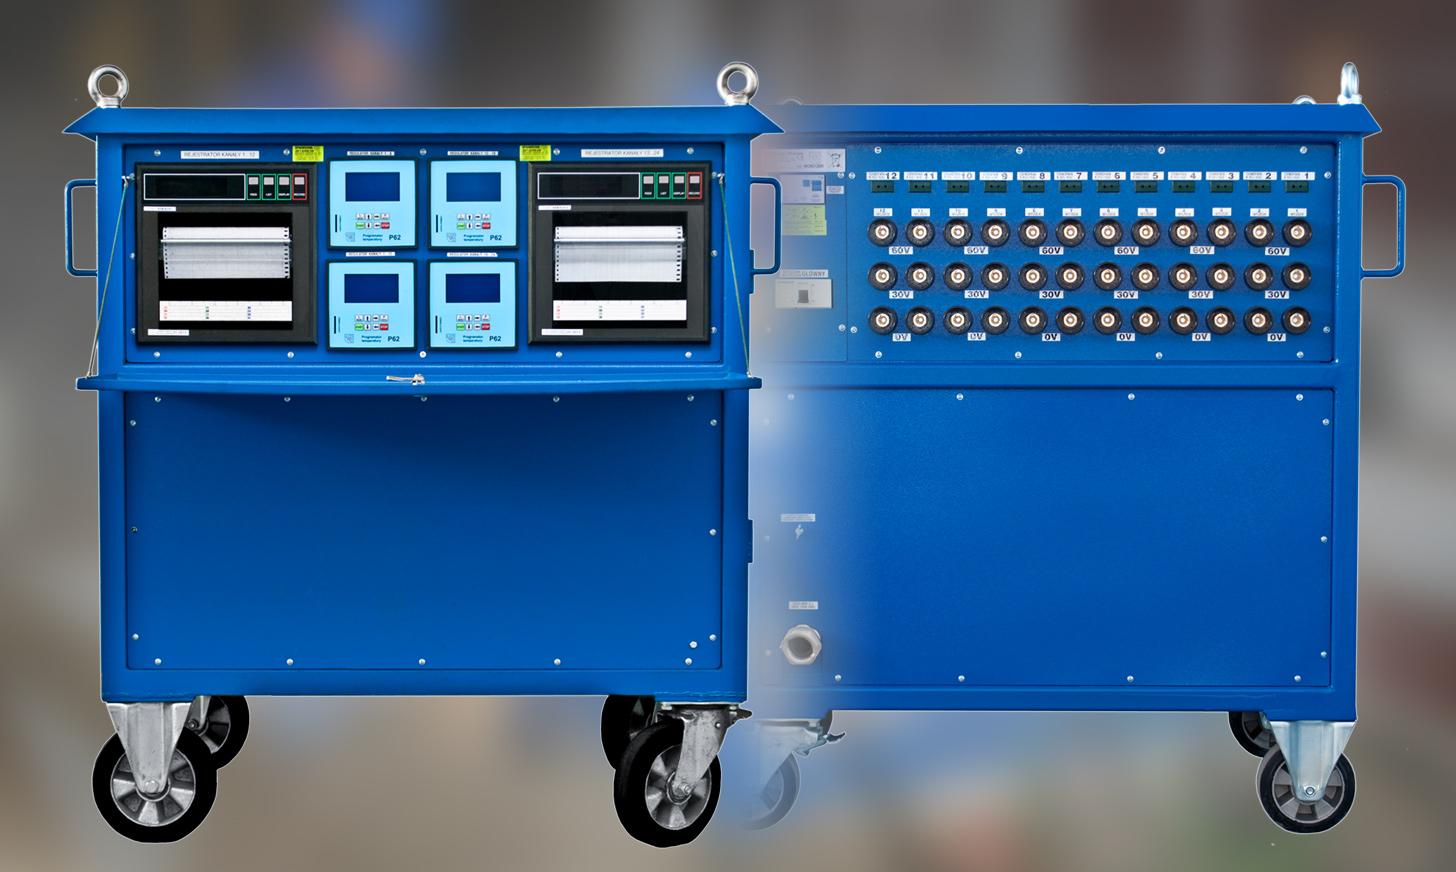 Resistive heat treatment units